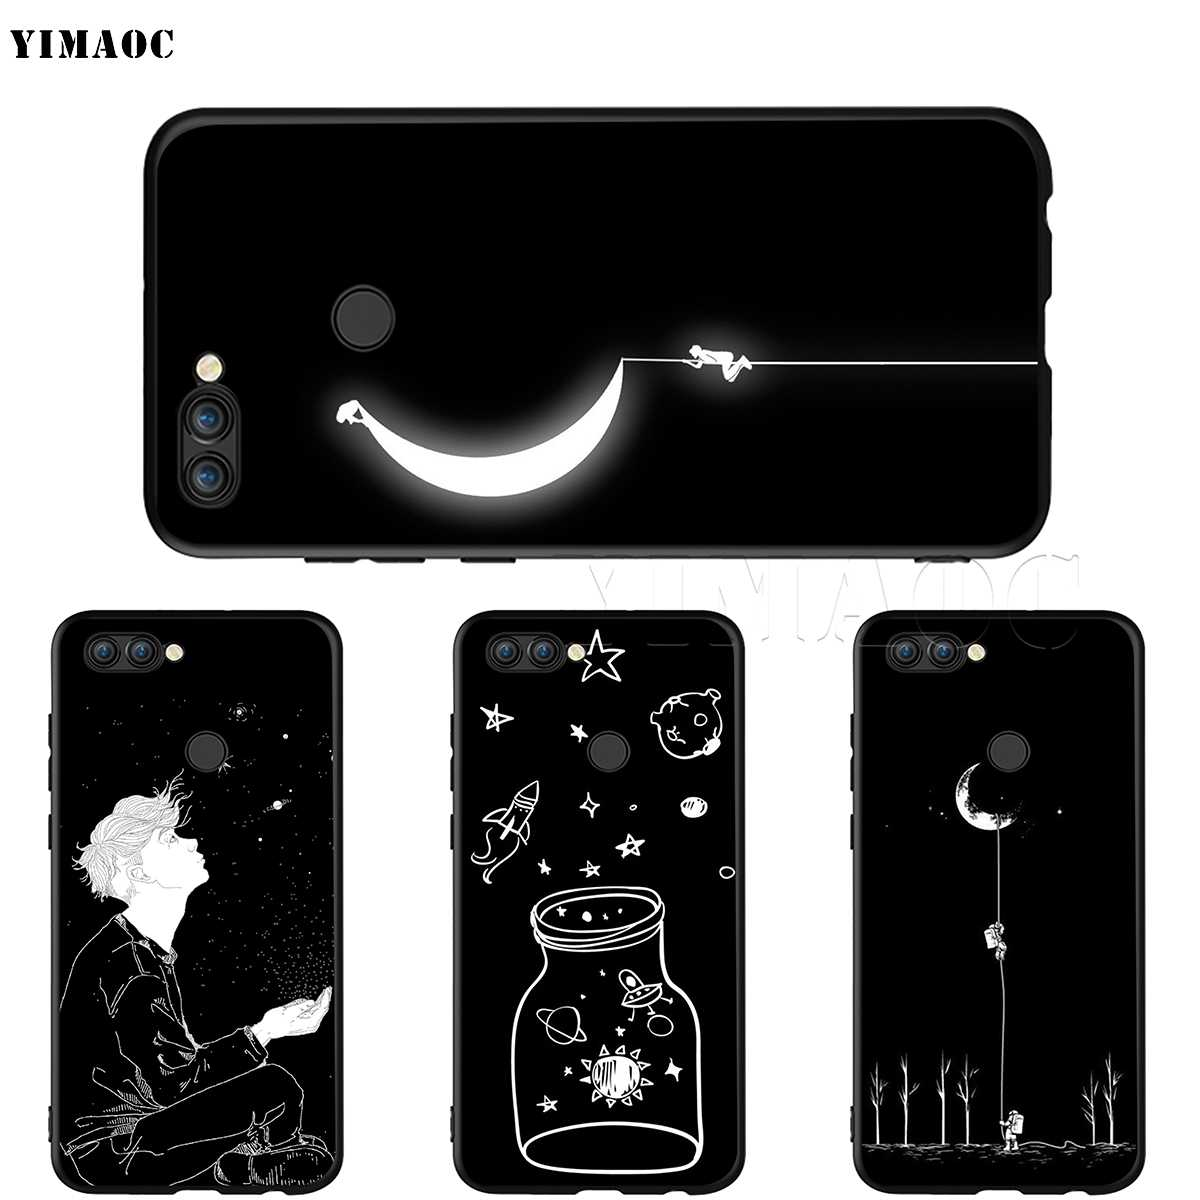 YIMAOC Black White Moon Stars Space Astronaut Case for Huawei Mate 10 P8 P9 P10 P20 P30 P Smart Lite Pro Mini 2017